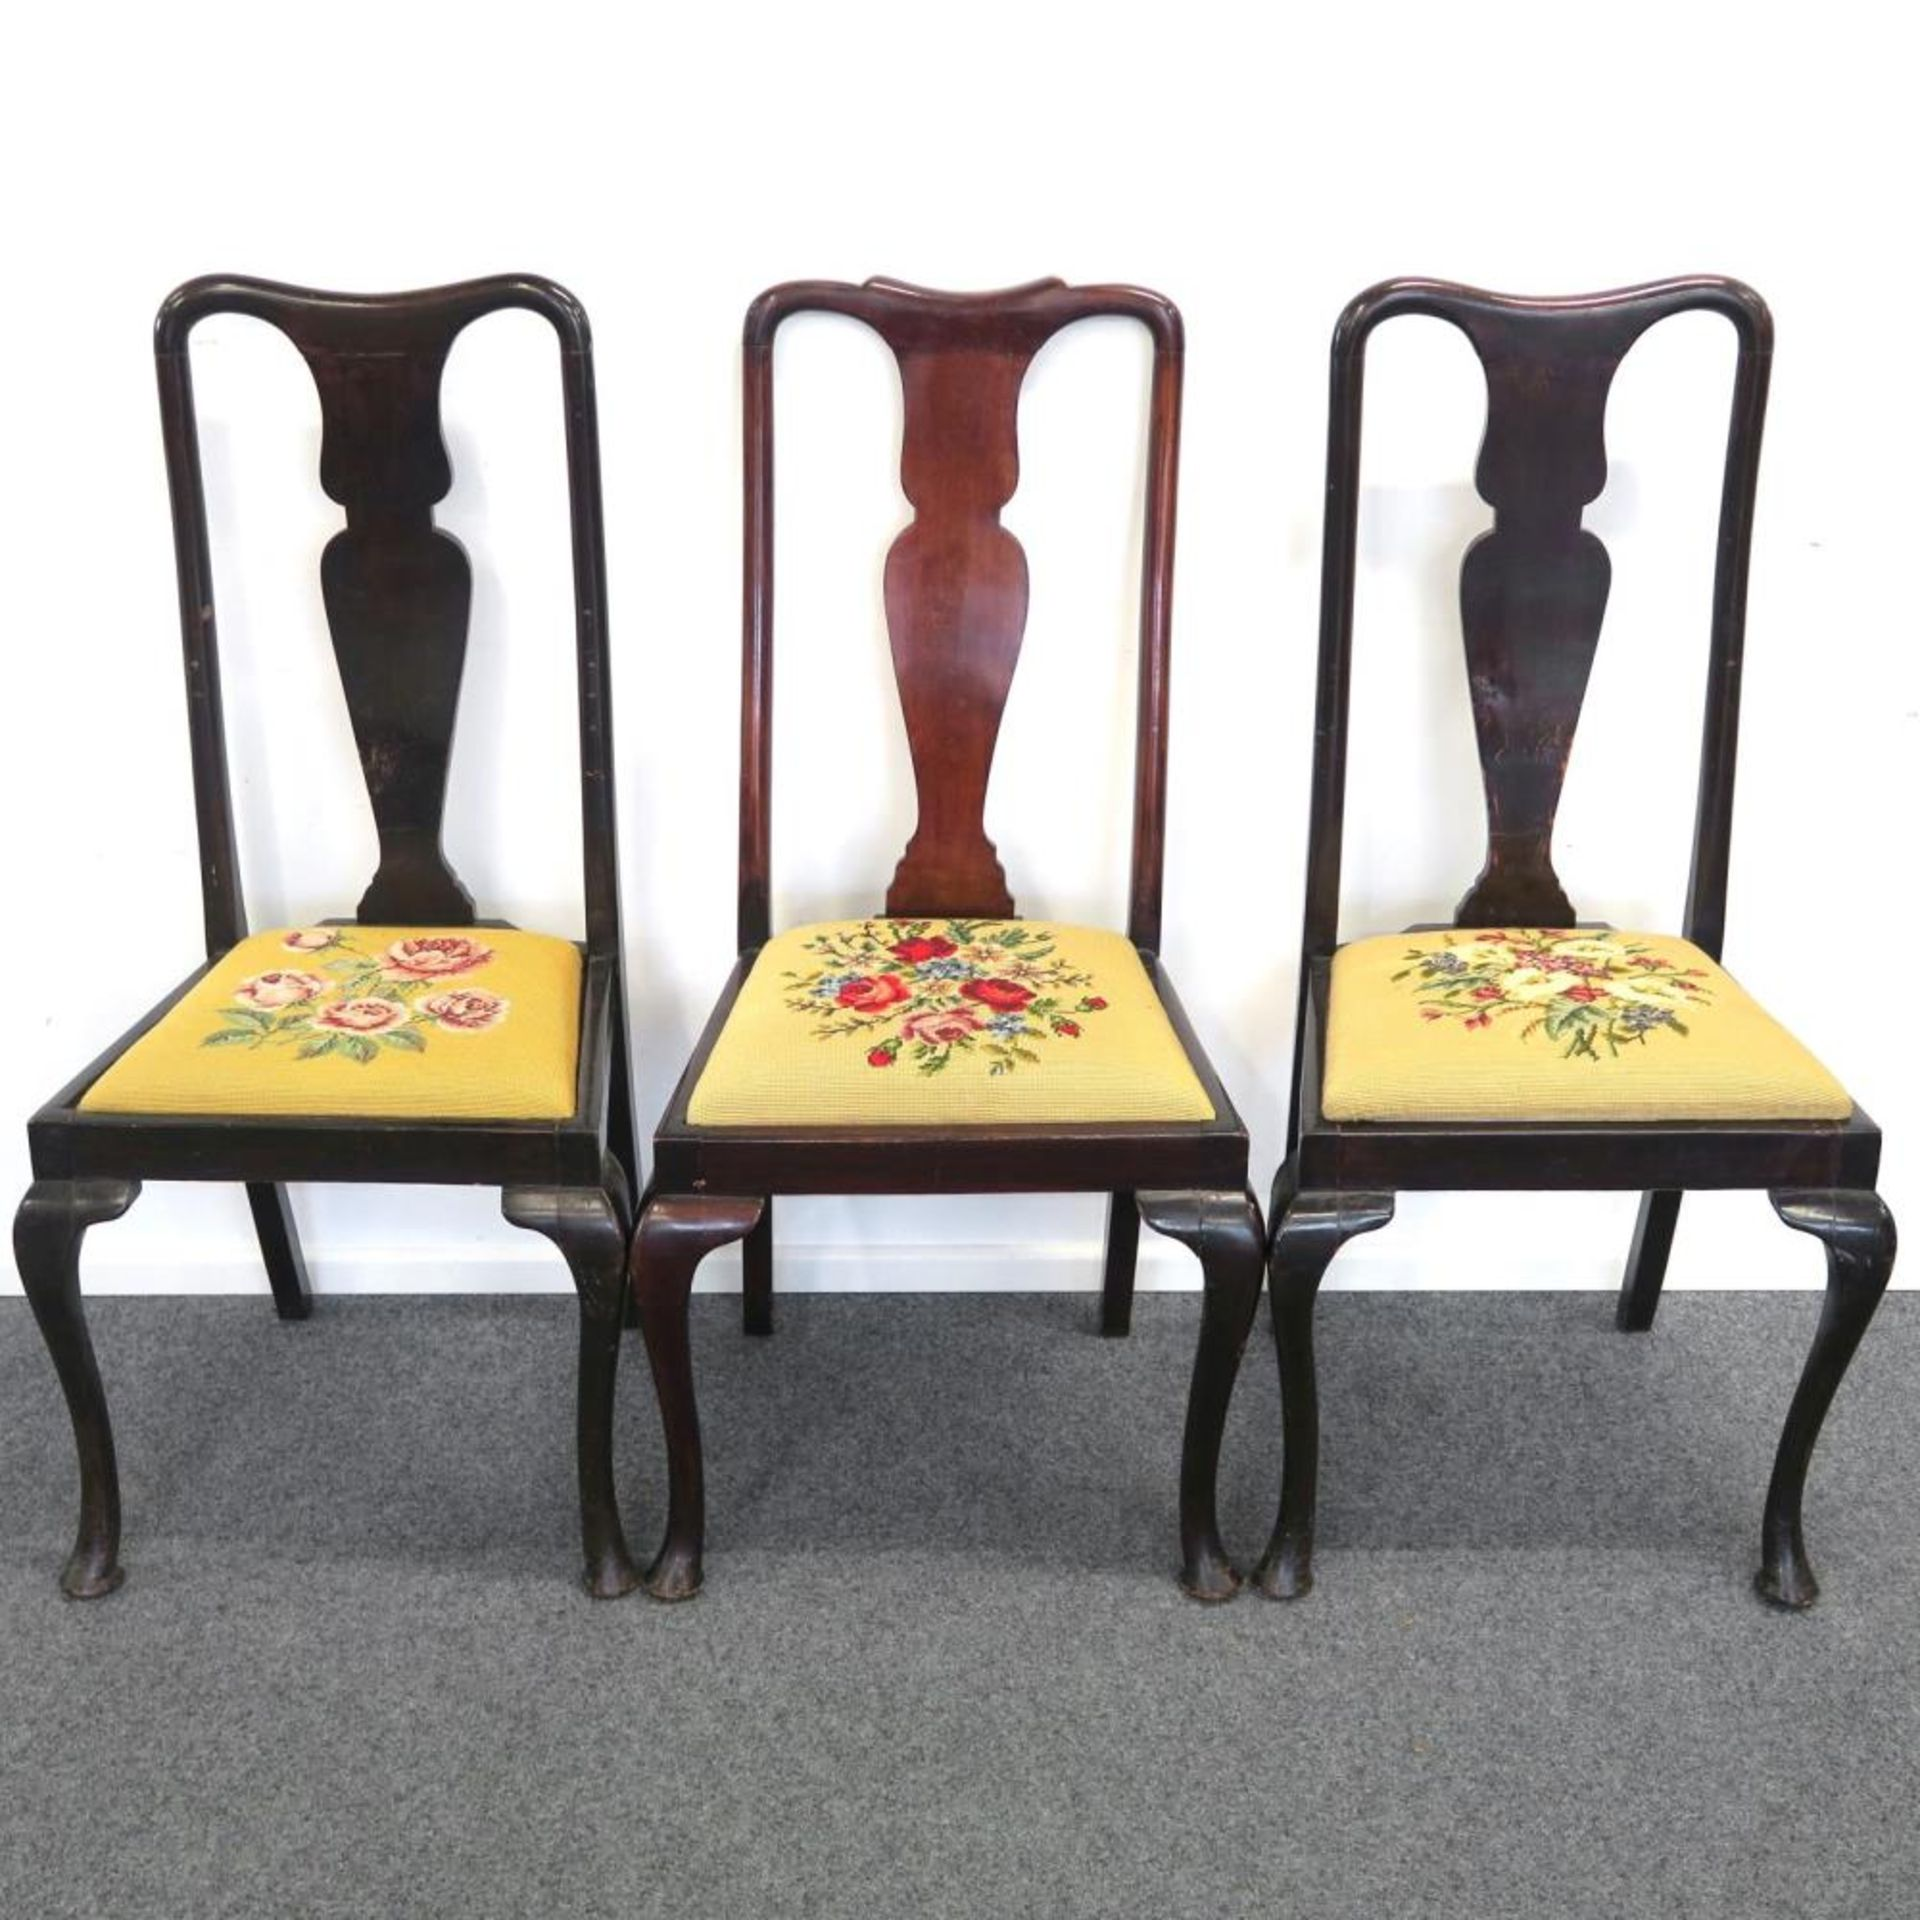 Acht Stühle